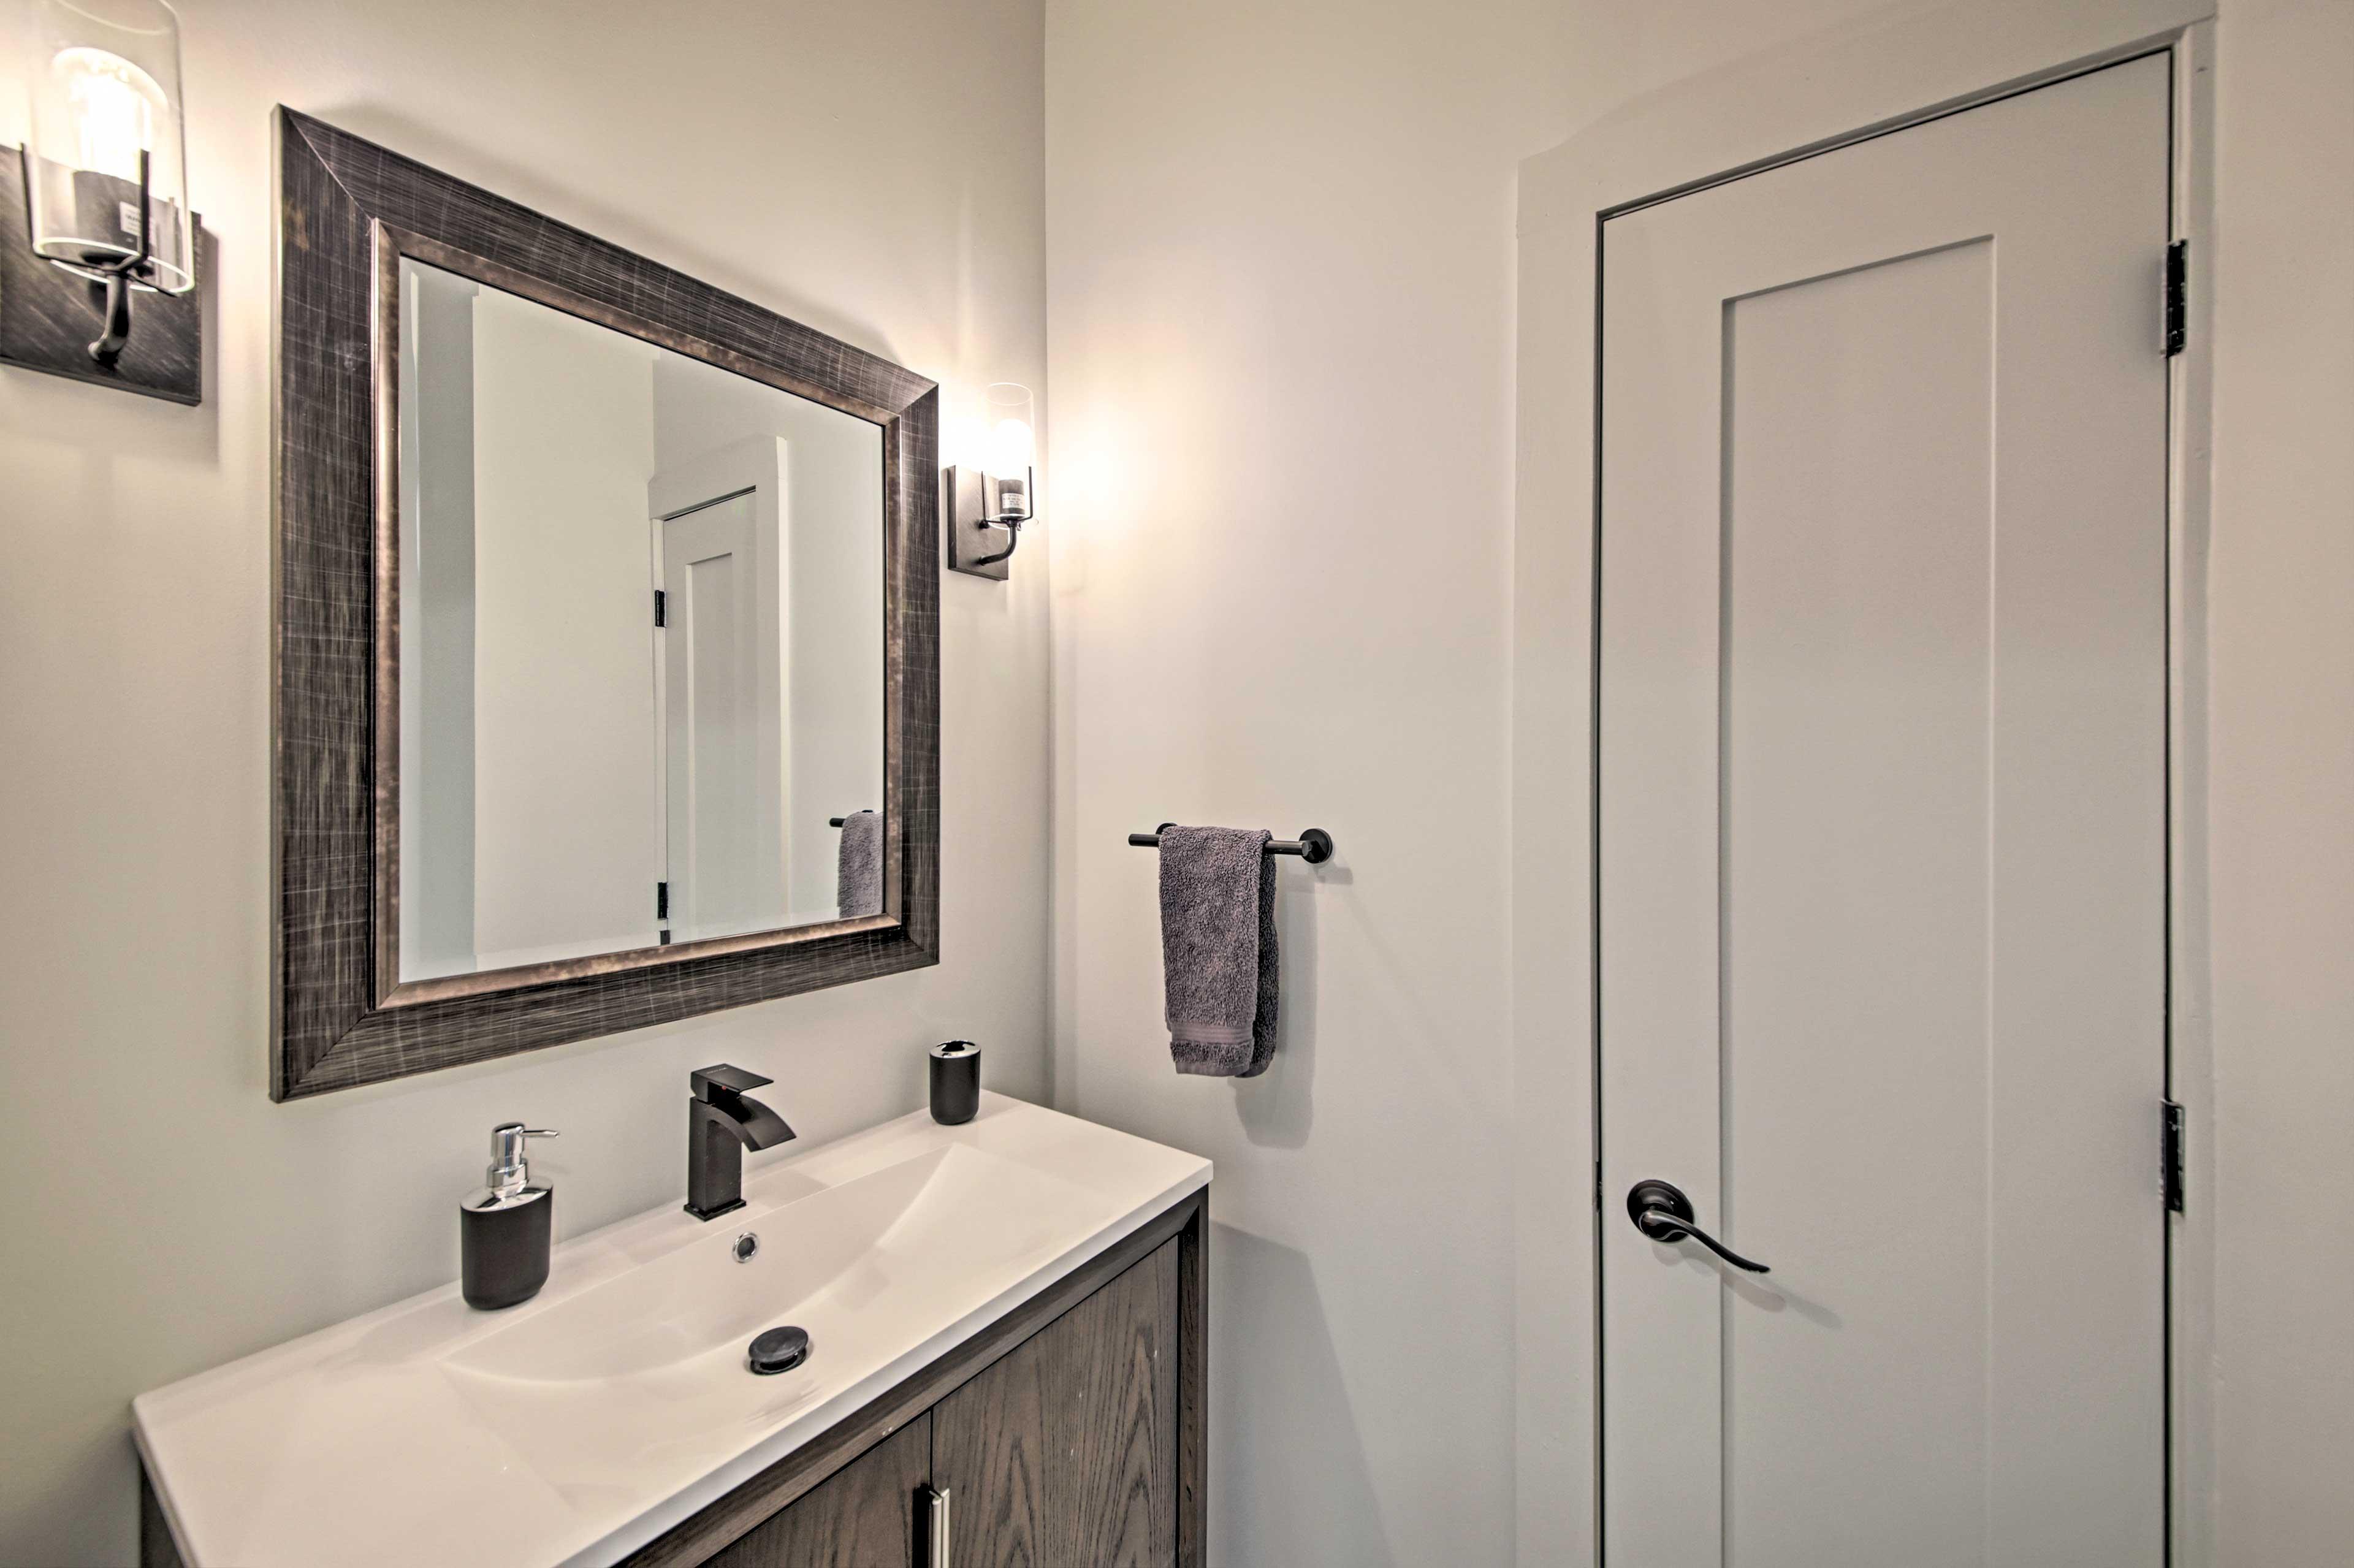 A half-bath is a convenient place to freshen up.